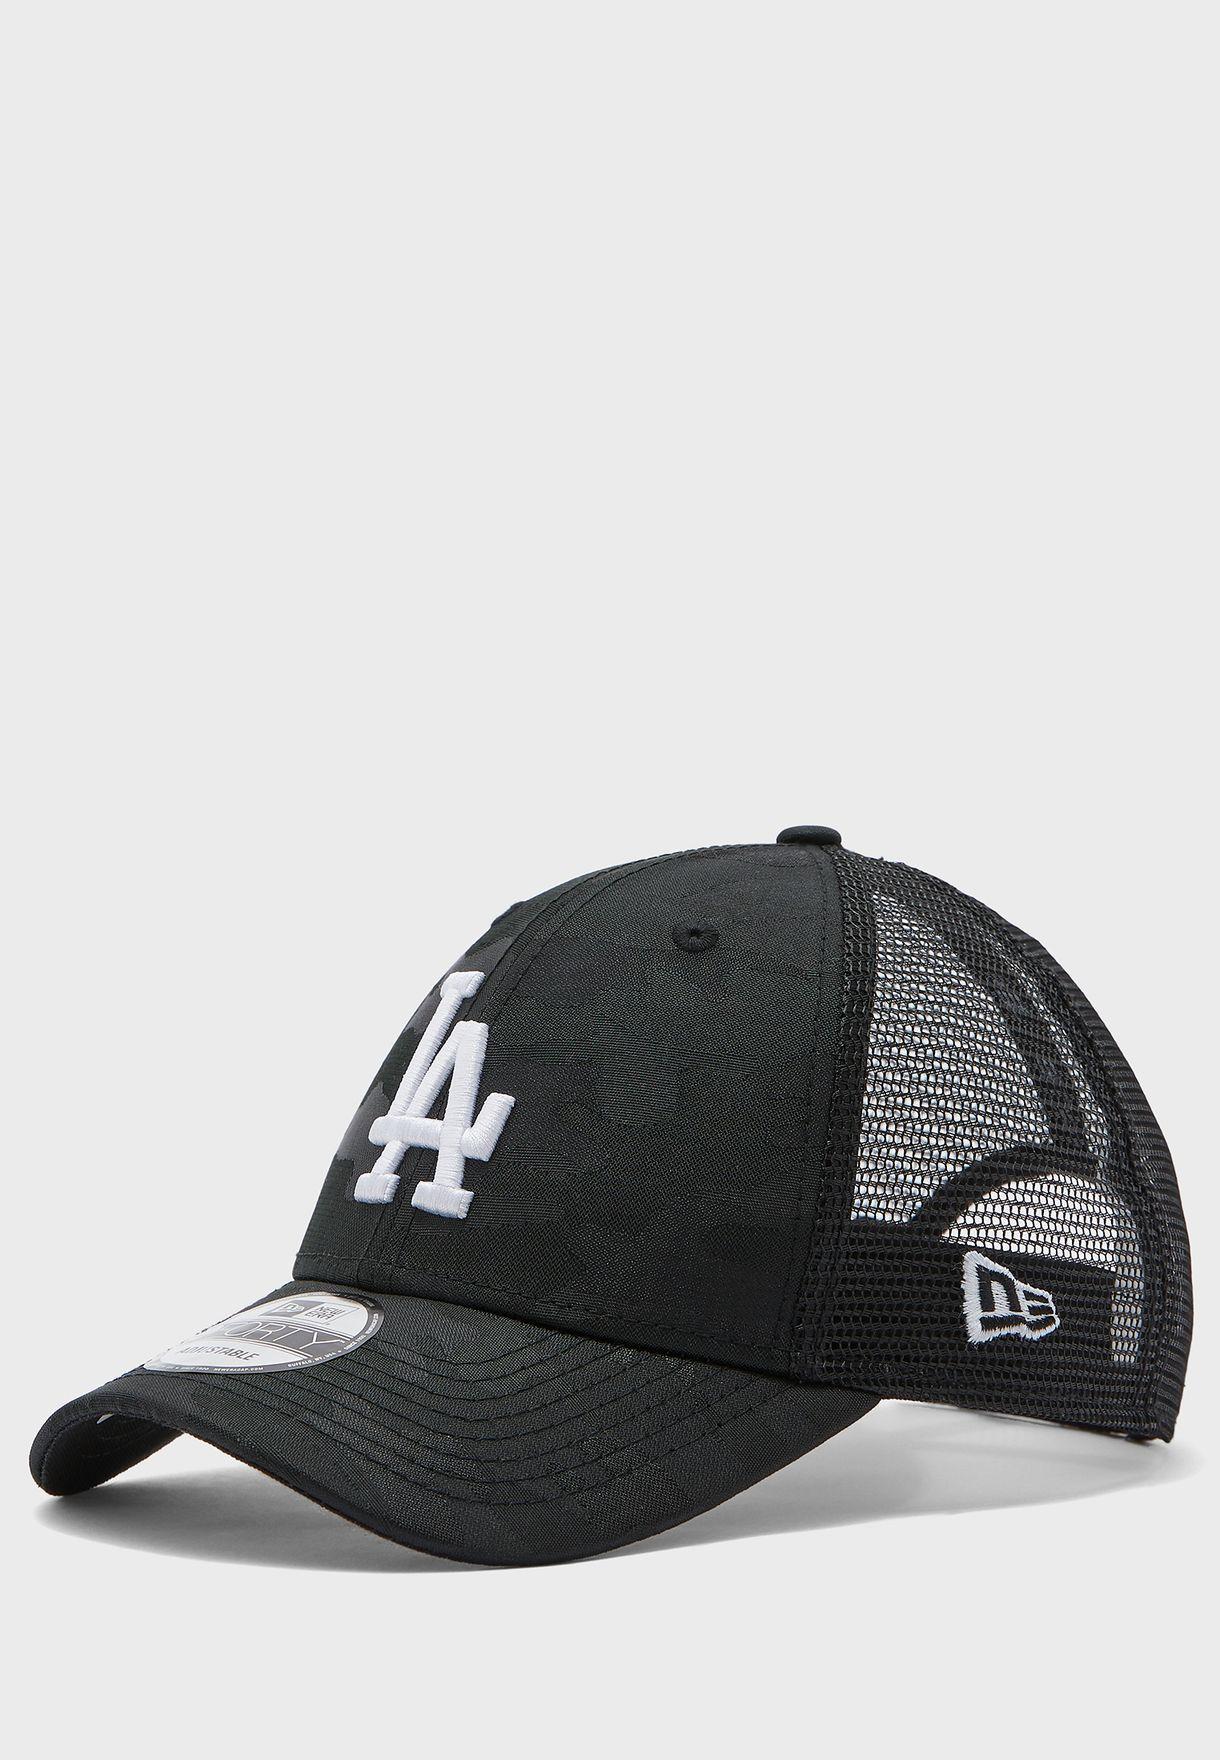 9Forty MLB Los Angeles Dodgers Seasonal Cap